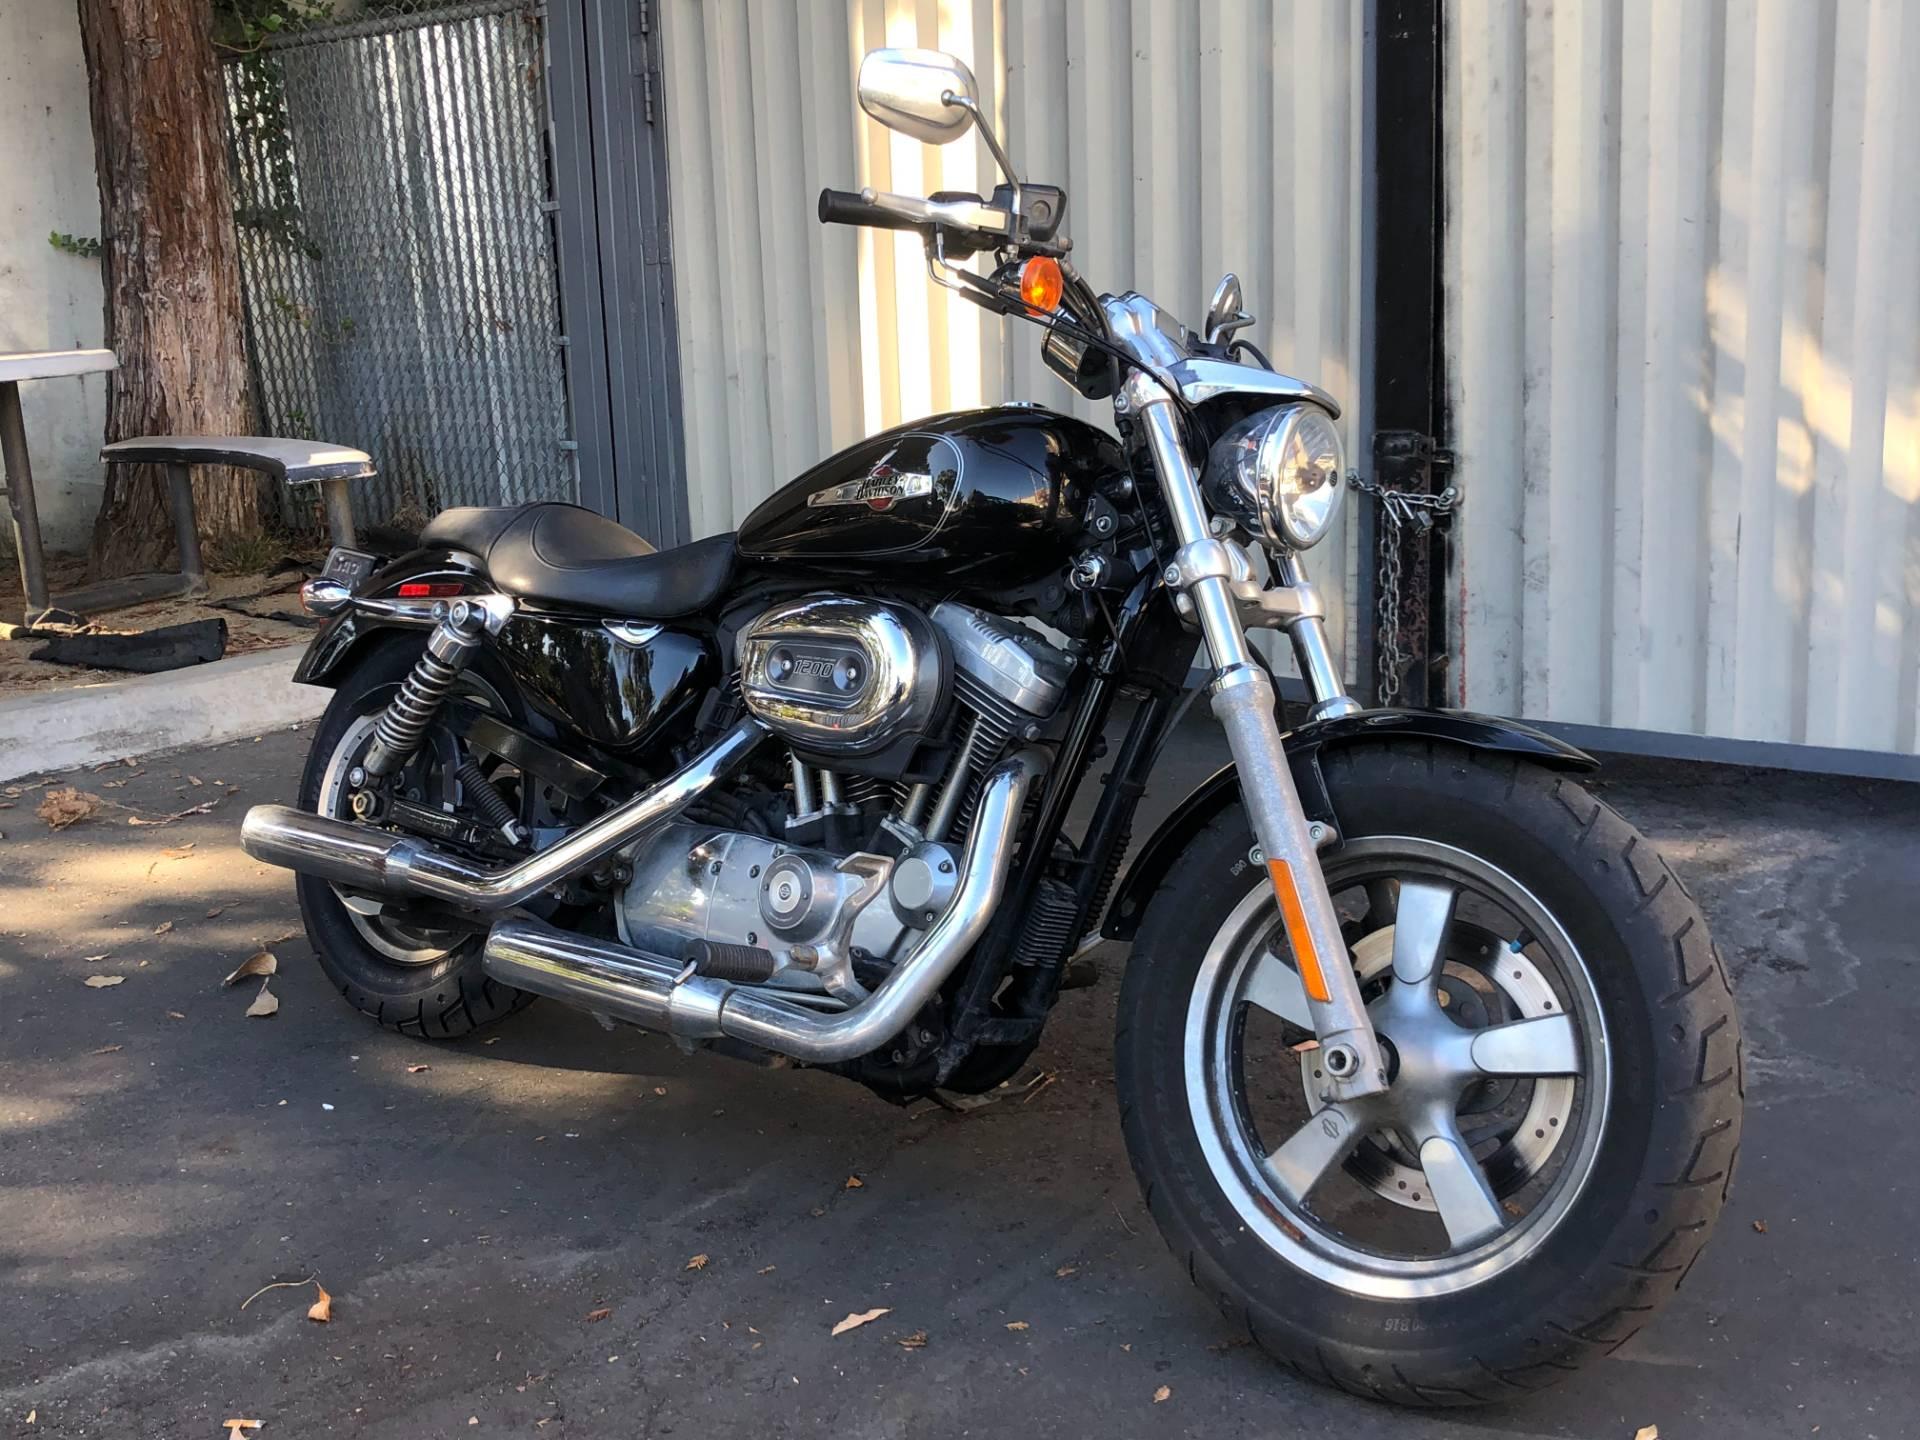 Used 2013 Harley Davidson Sportster 1200 Custom Vivid Black Motorcycles In San Jose Ca 400633